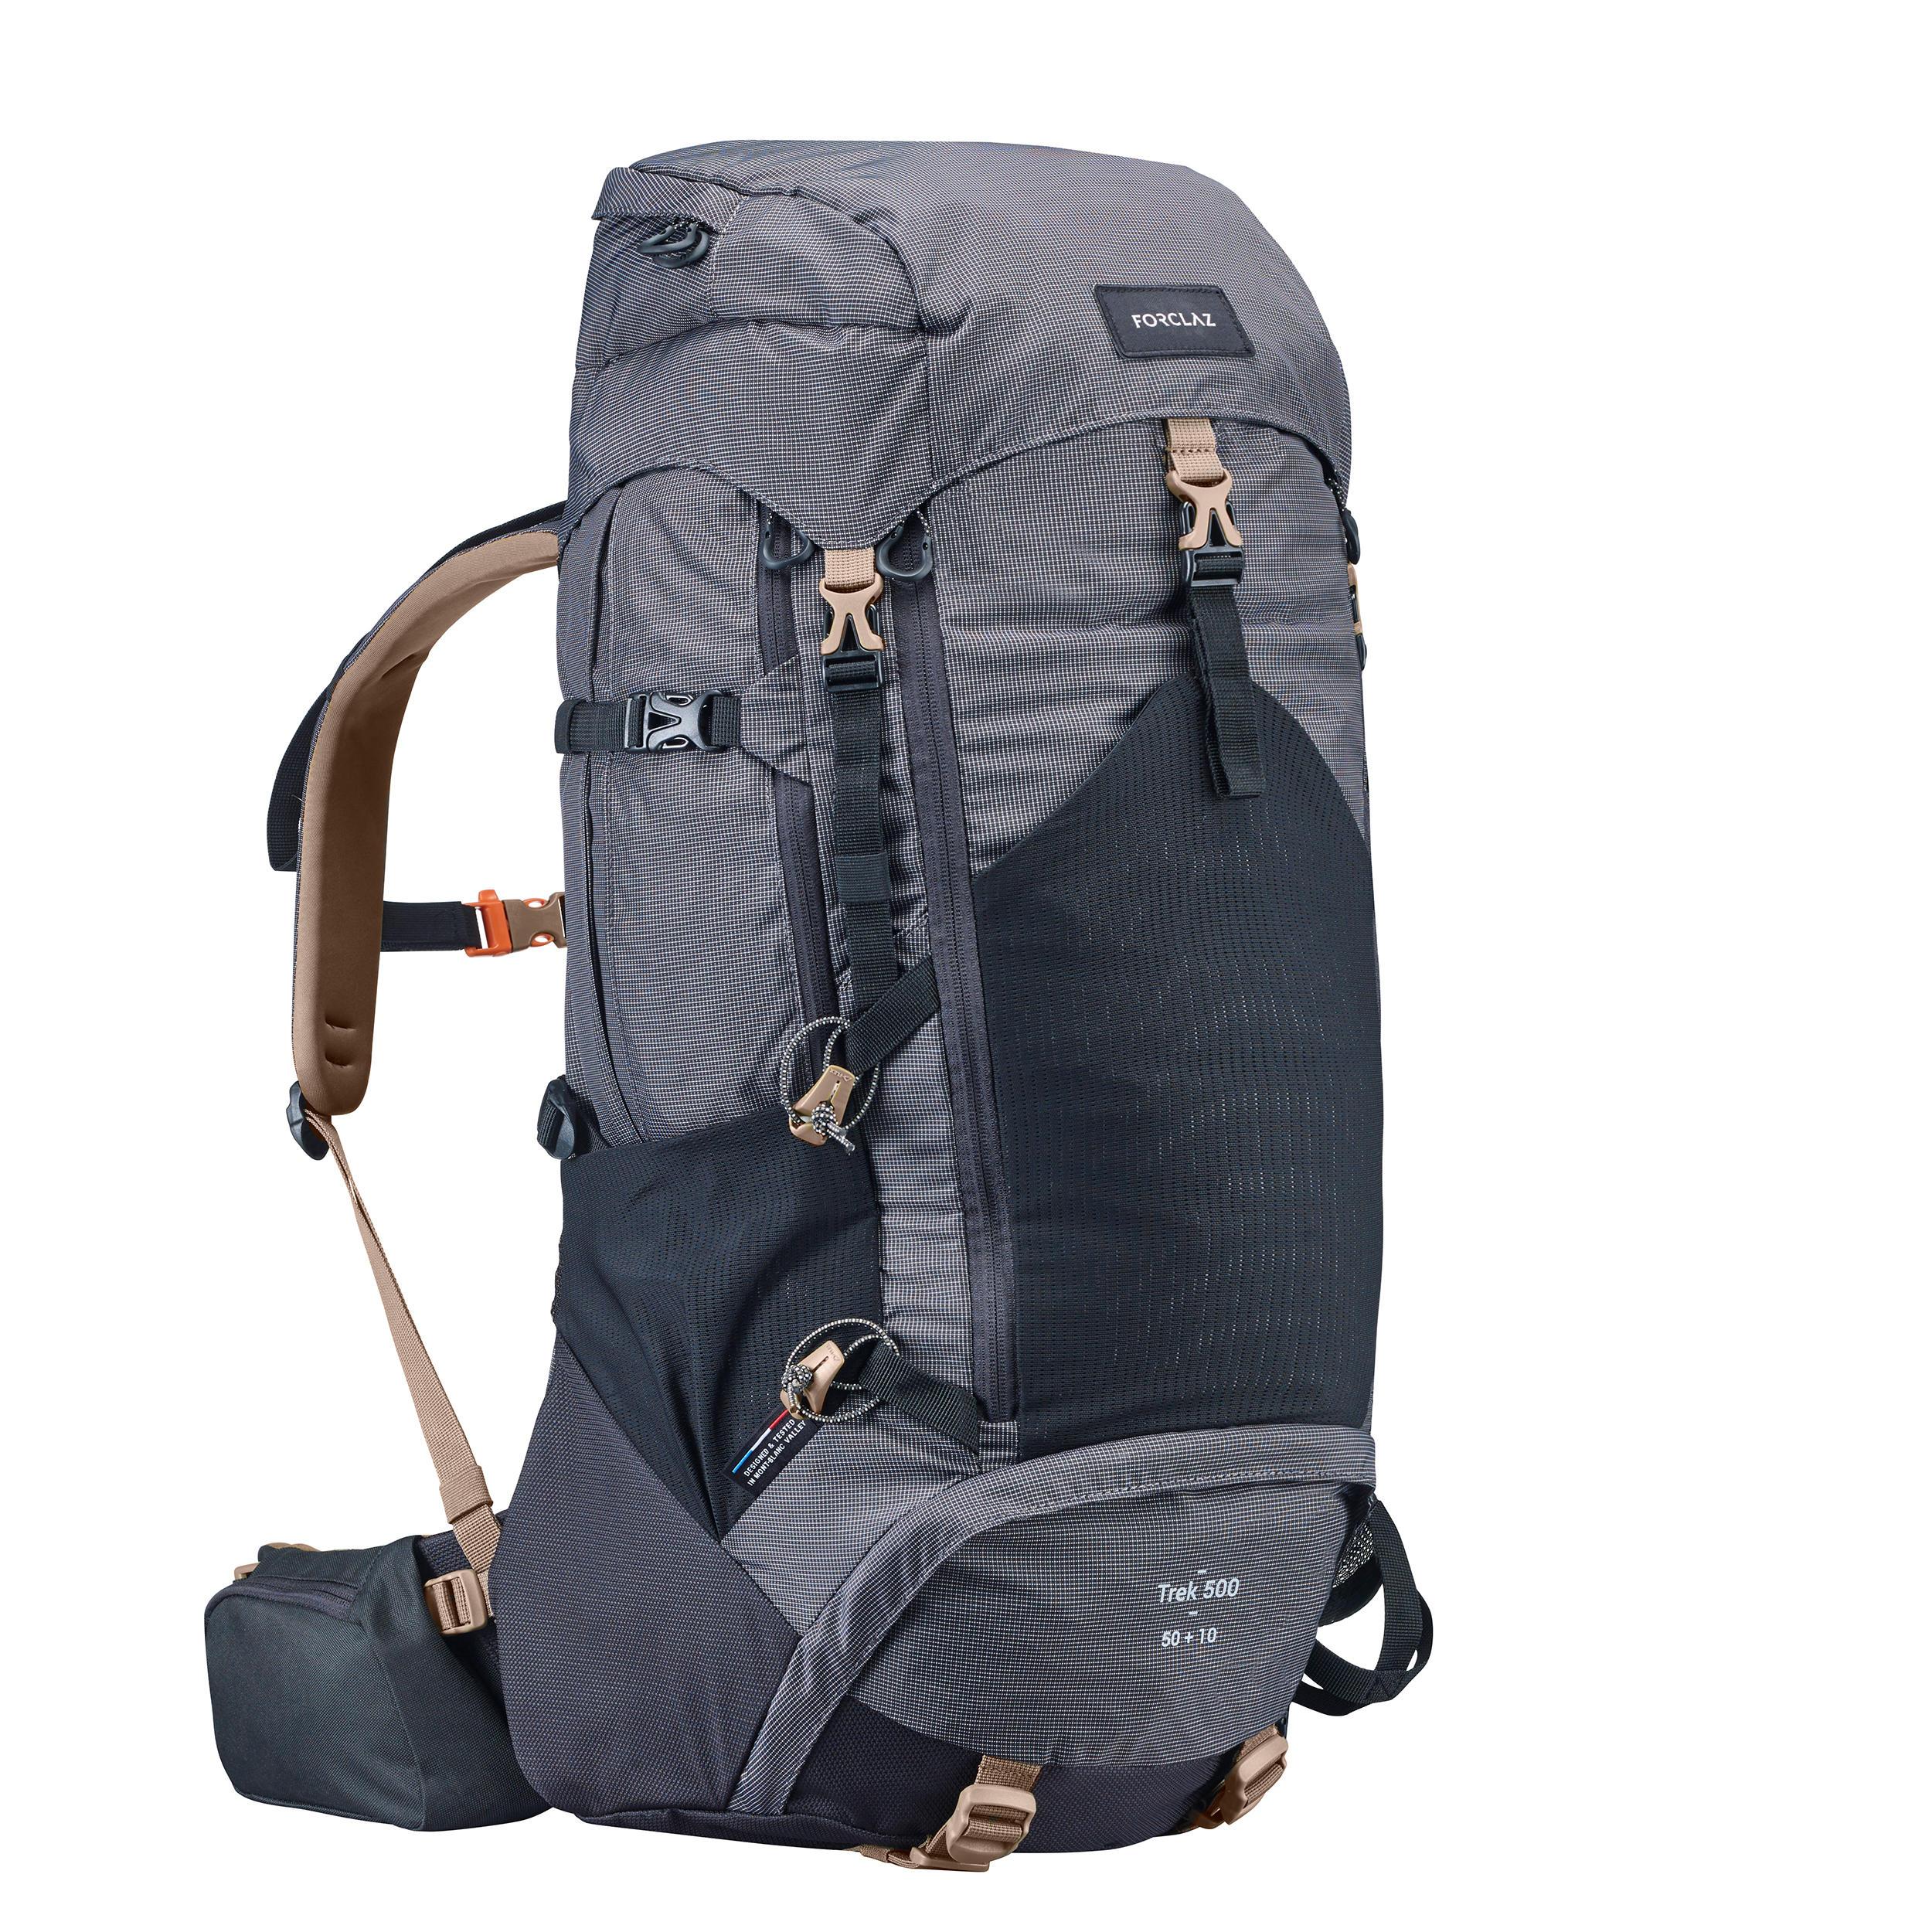 Rucsac Trekking TREK500 50+10L imagine